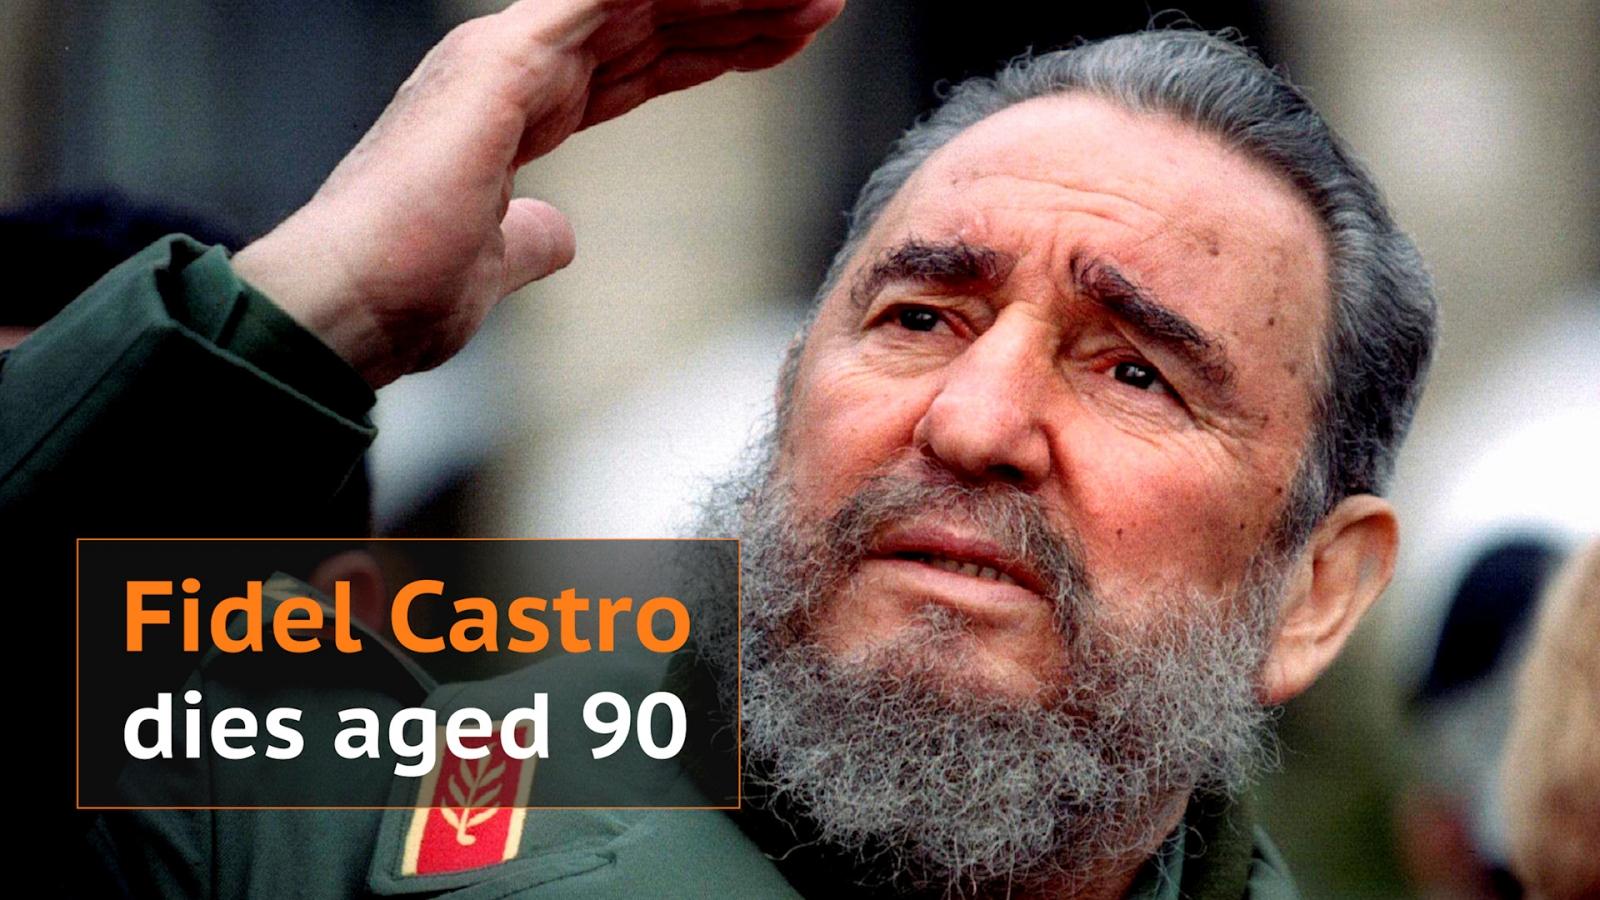 Fidel Castro dies aged 90